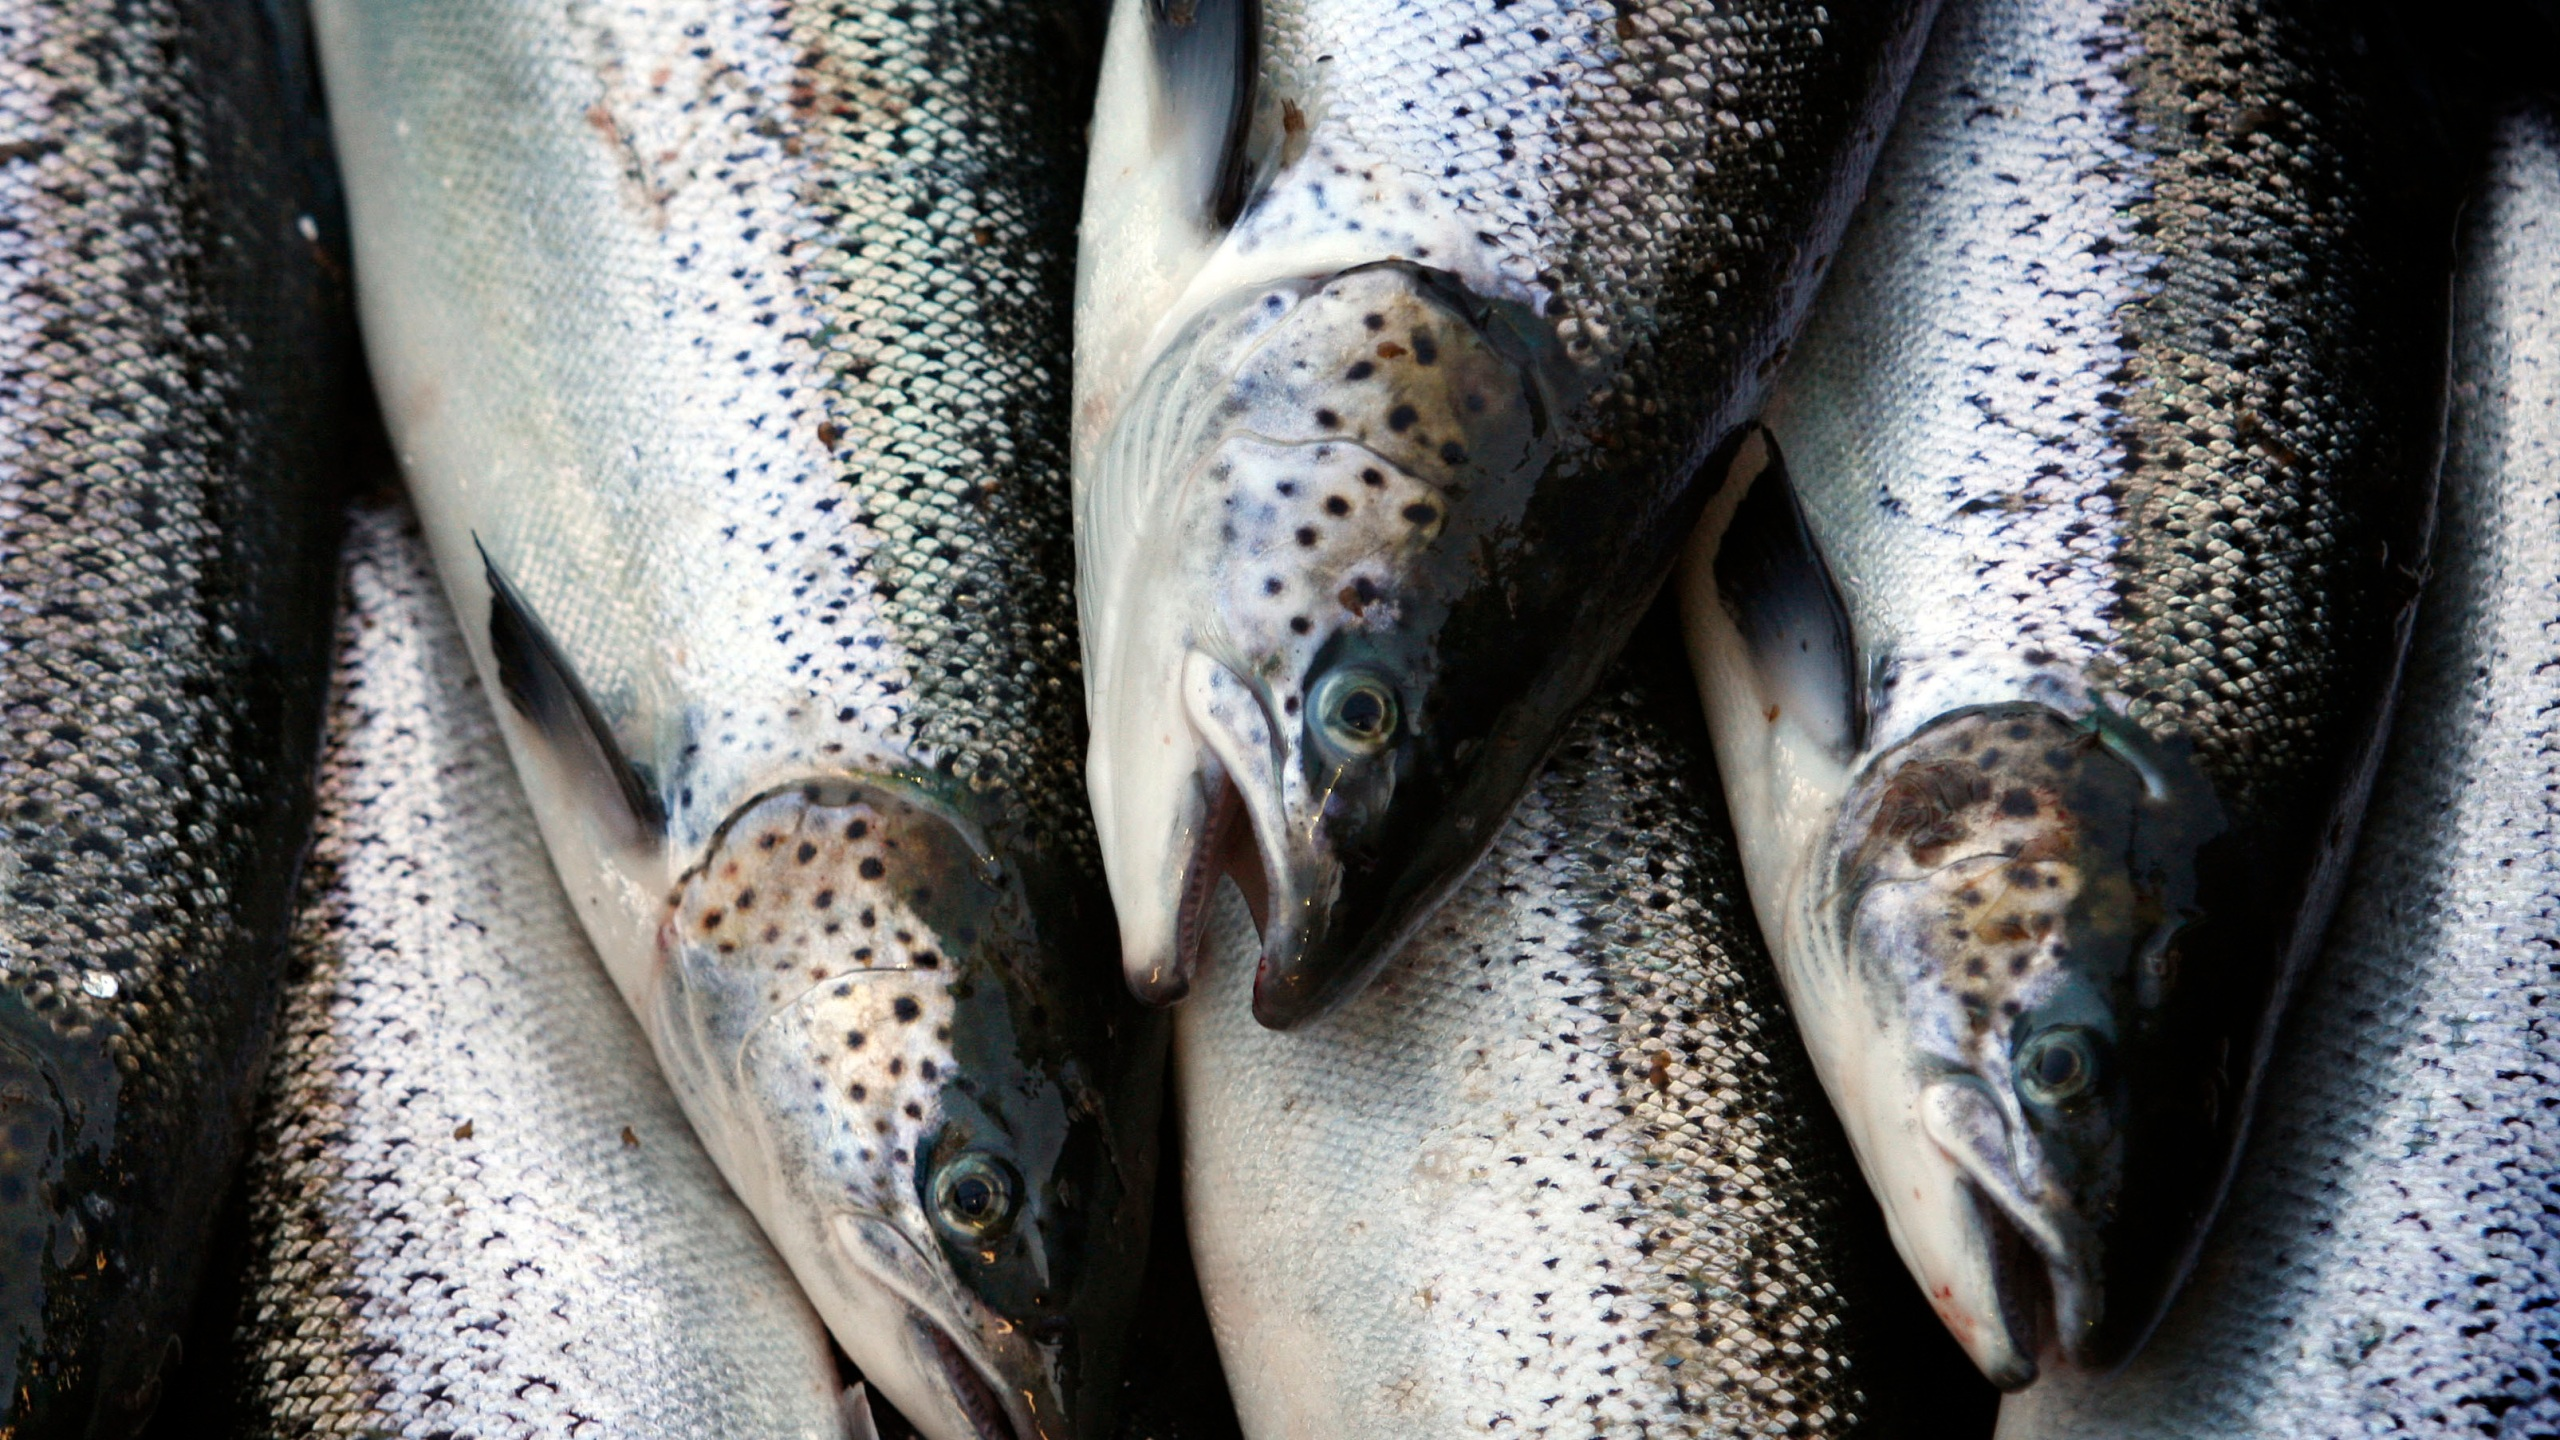 Seafood_Deficit_41528-159532.jpg18819988